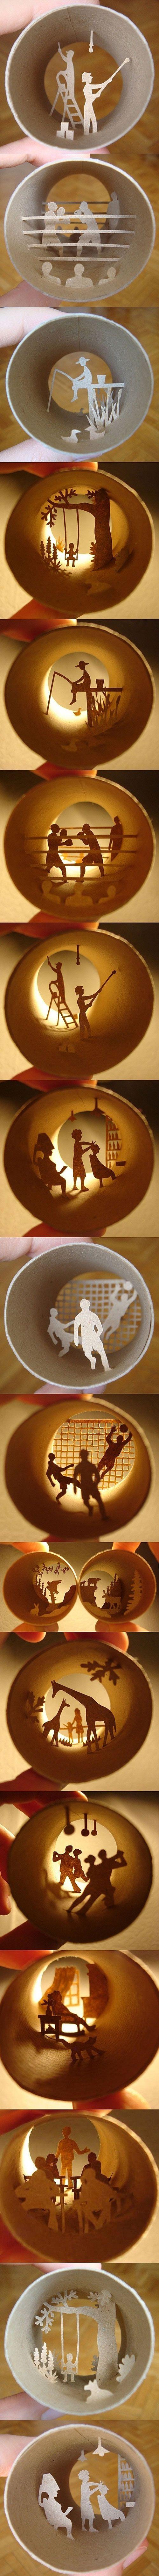 toilet paper art!